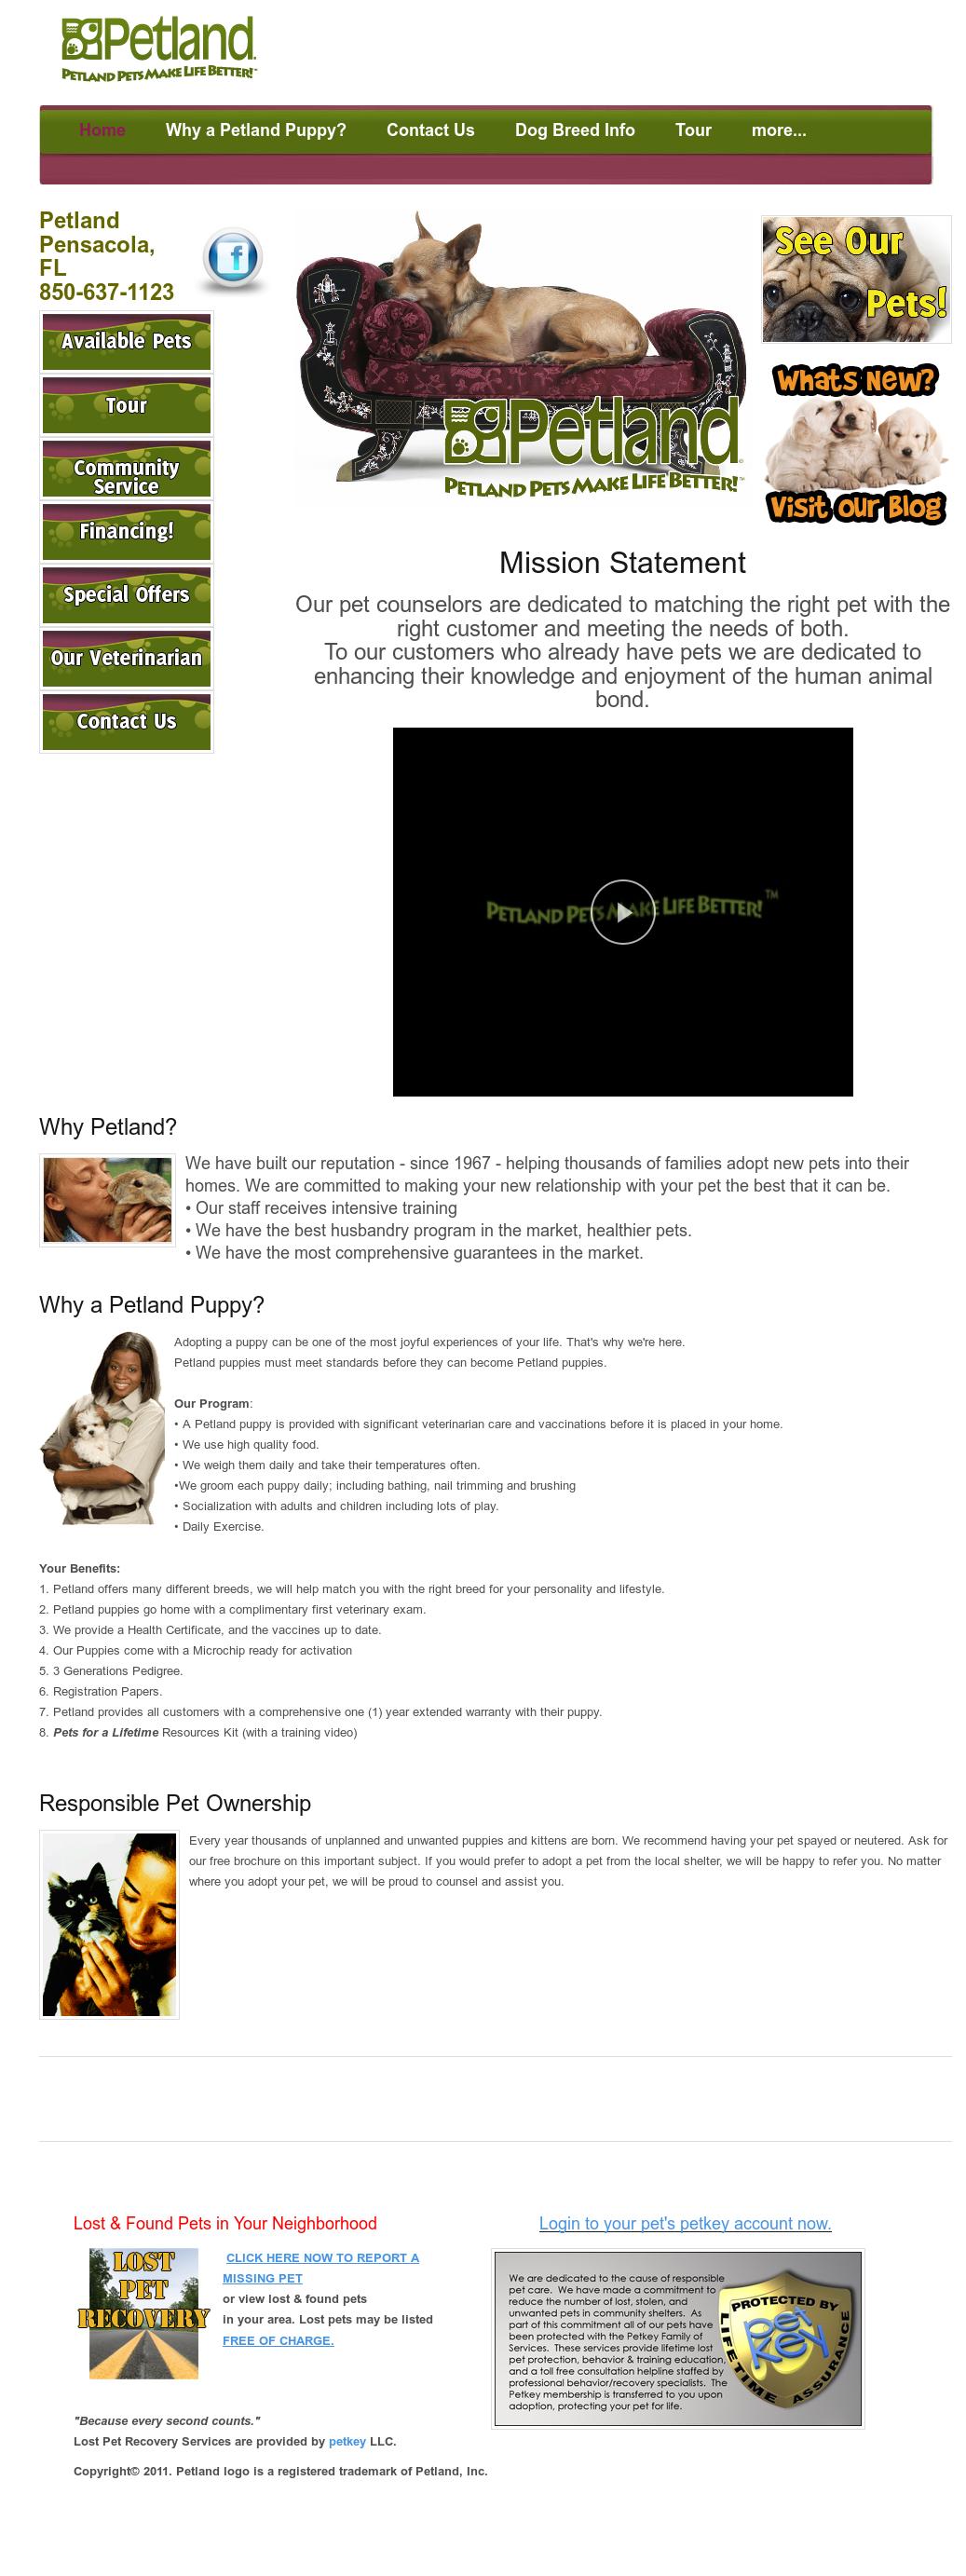 Petland Pensacola Competitors, Revenue and Employees - Owler